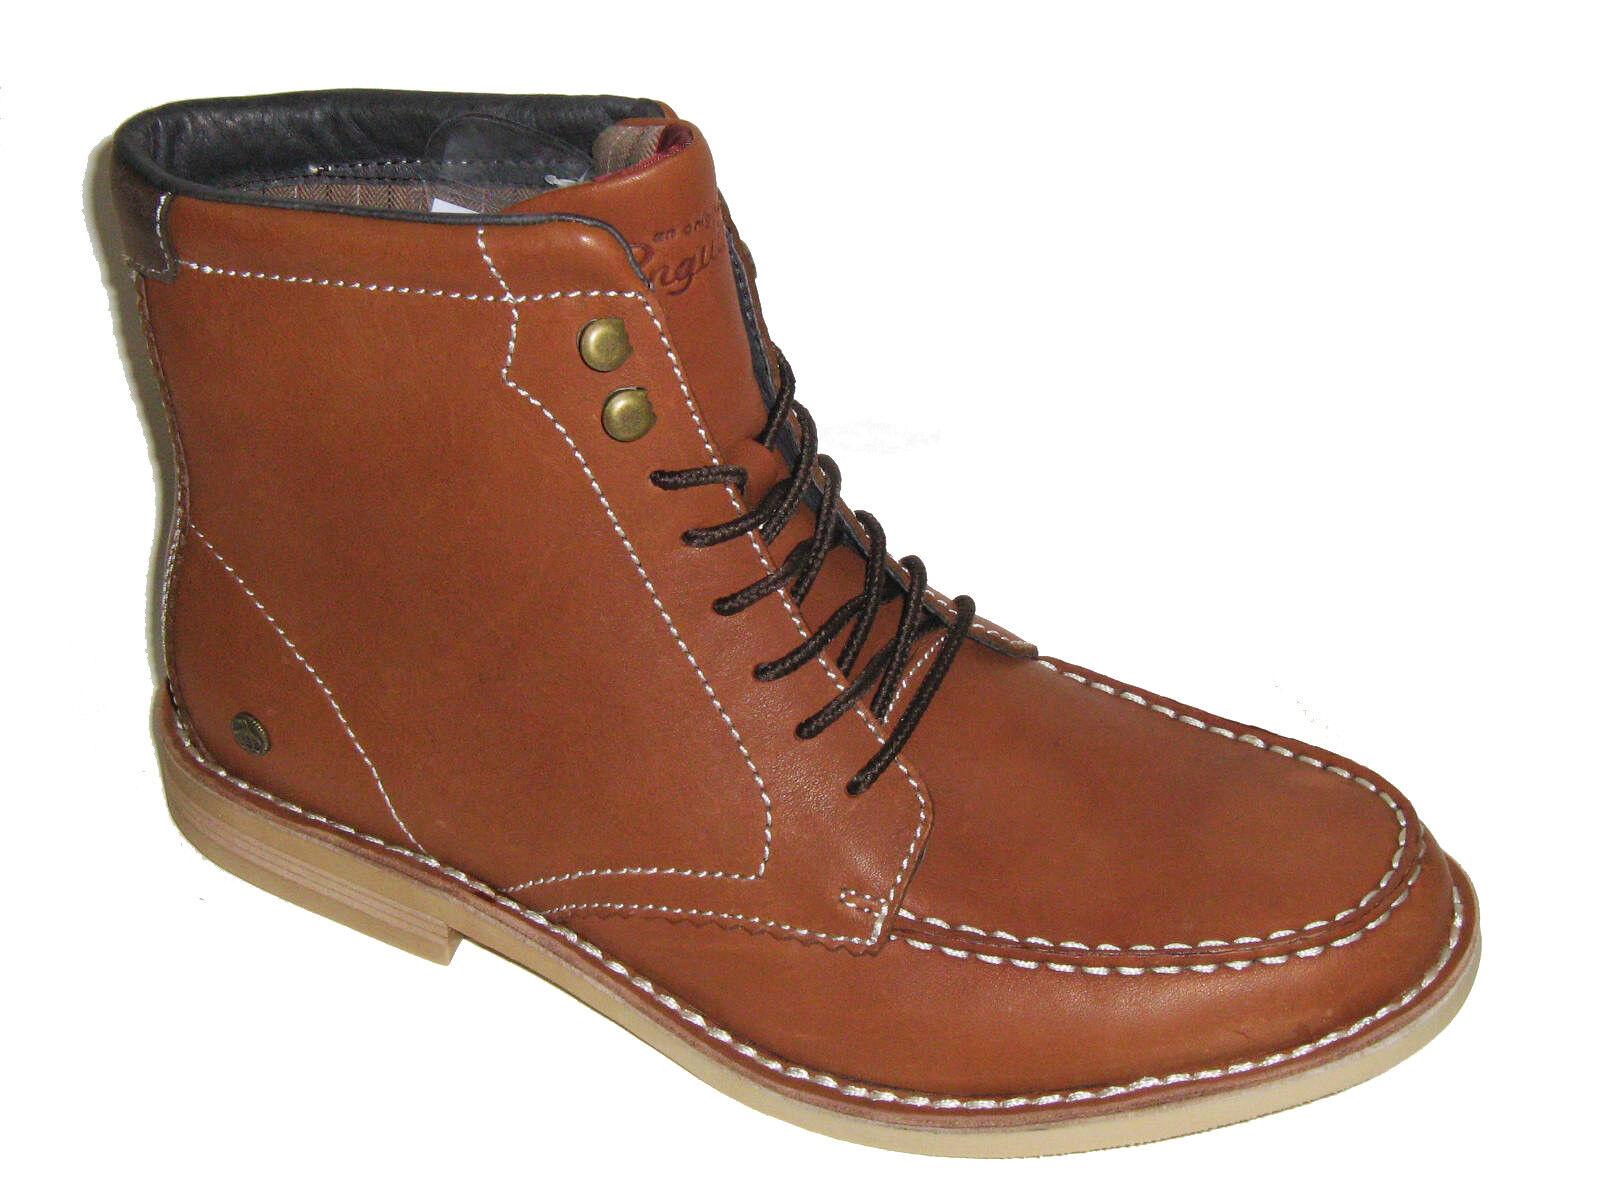 Original Penguin Men's Shoes Hammer Leather Dress Boots Tortoise Shell Size 9